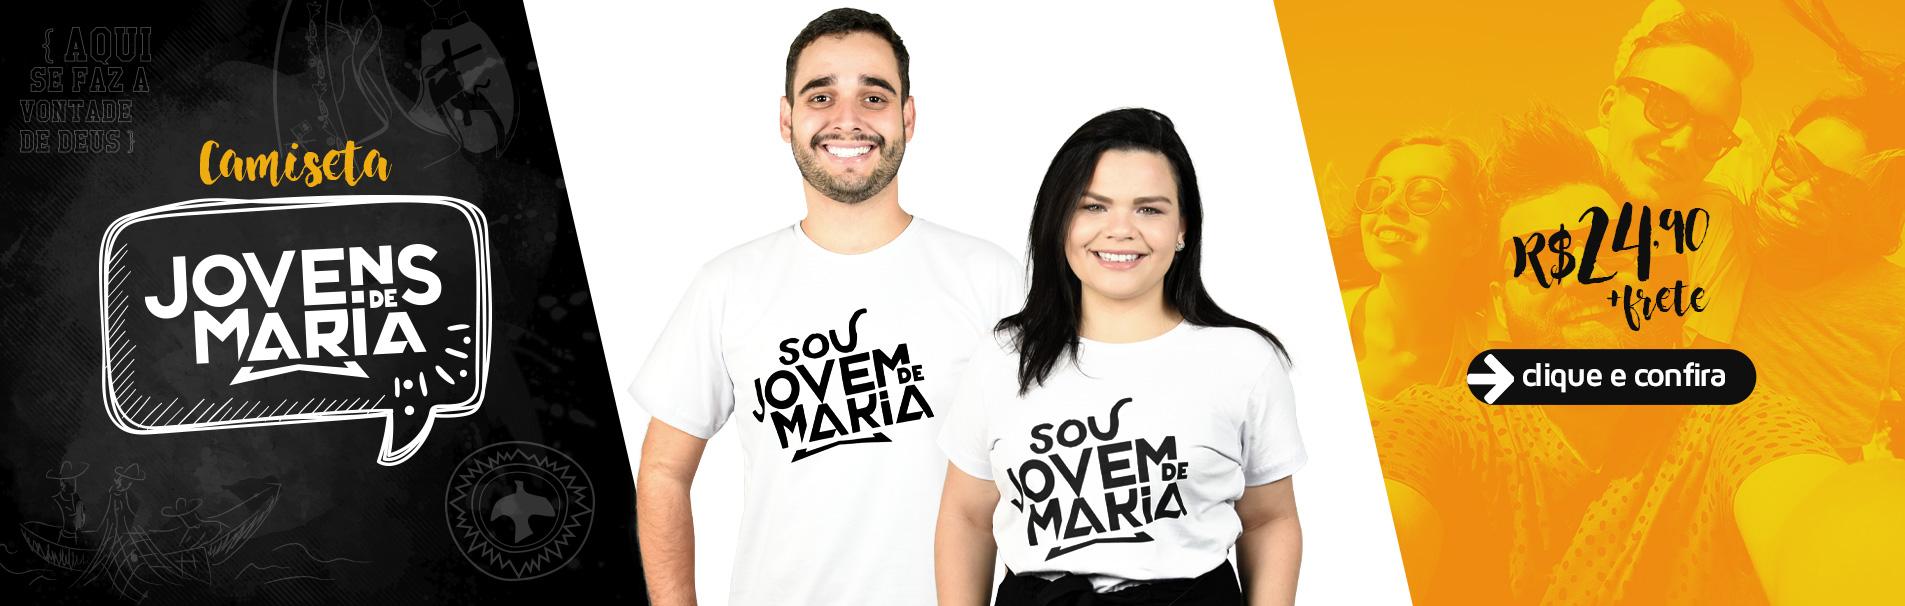 Camiseta Jovens